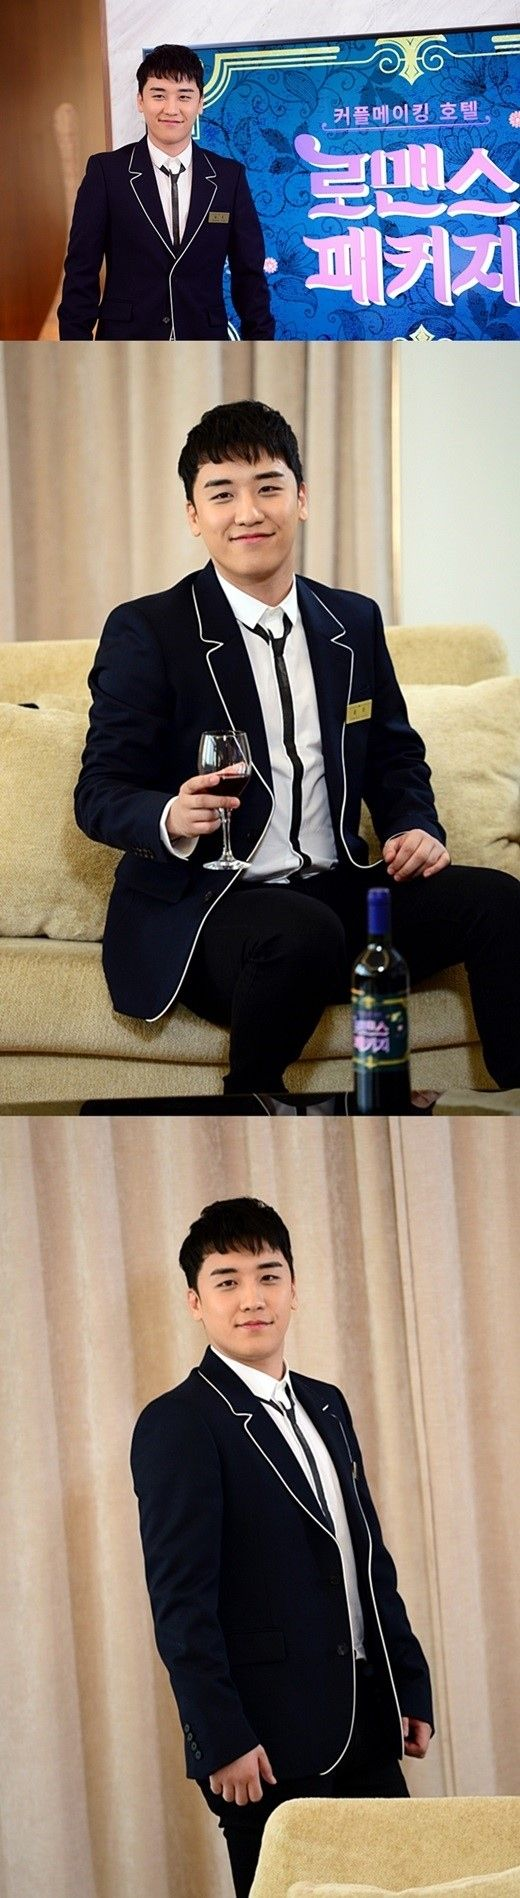 【BIGBANG NEWS】BIGBANGのV.I、新番組「ロマンスパッケージ」スペシャルMCとして登場…予告編を公開(動画あり)